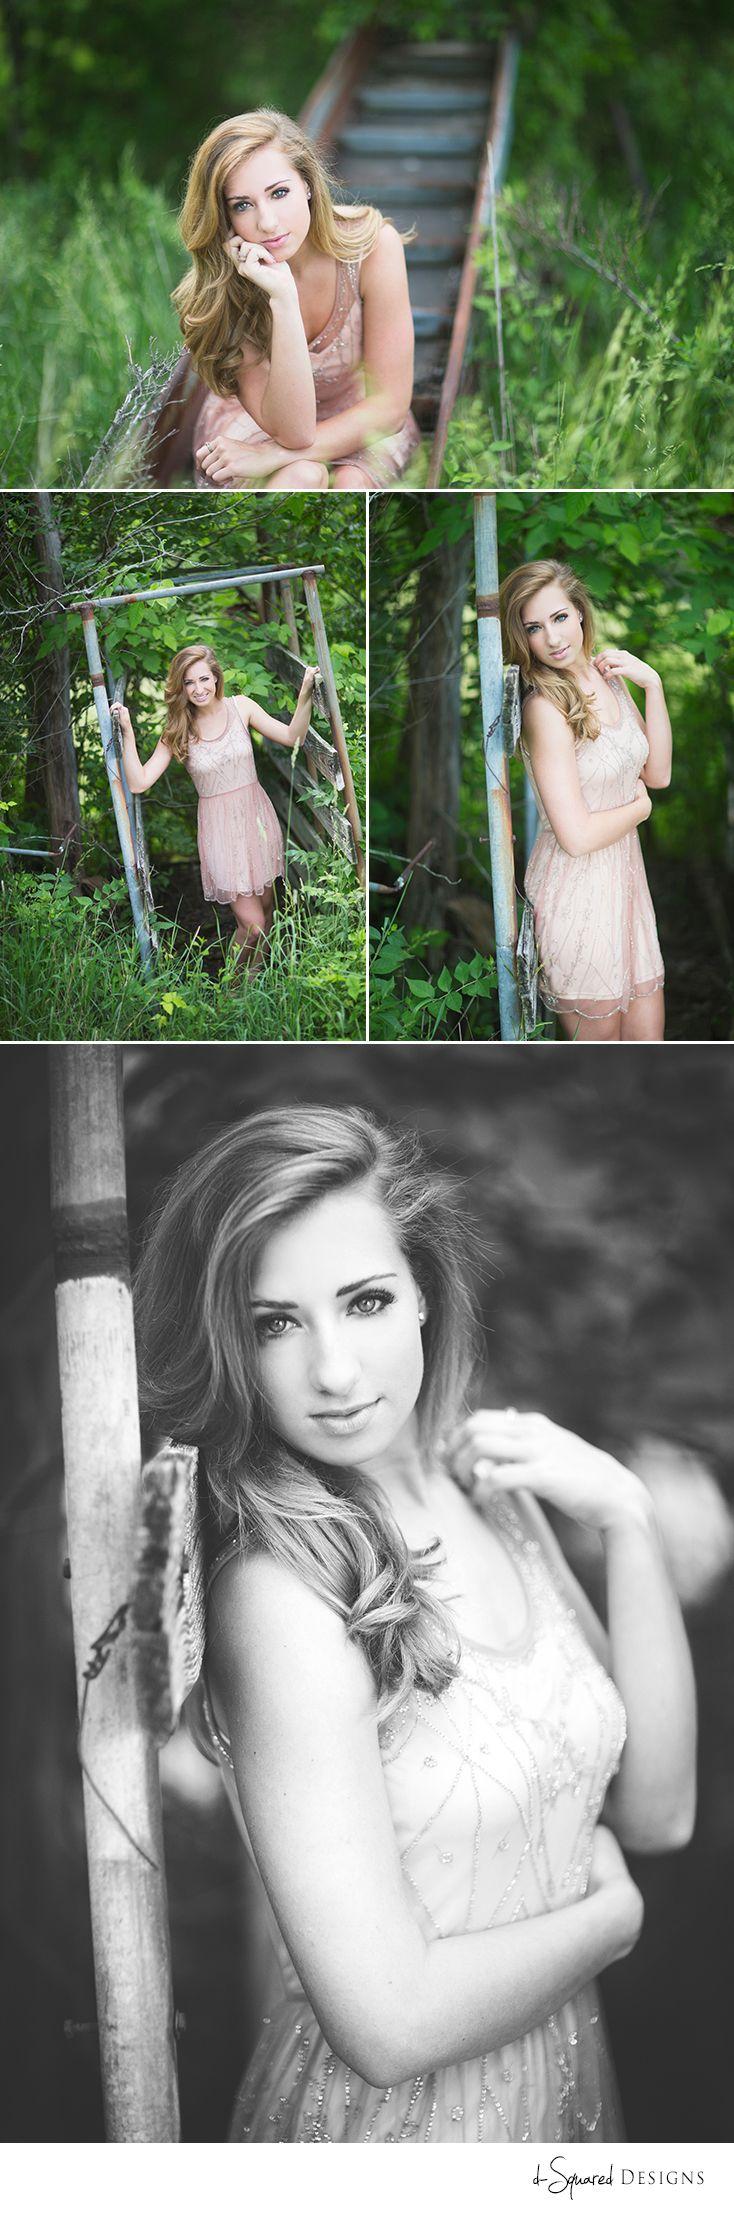 d-Squared Designs Columbia, MO Senior Photography. Senior girl photography. Senior girl poses. Country girl glamour inspiration.